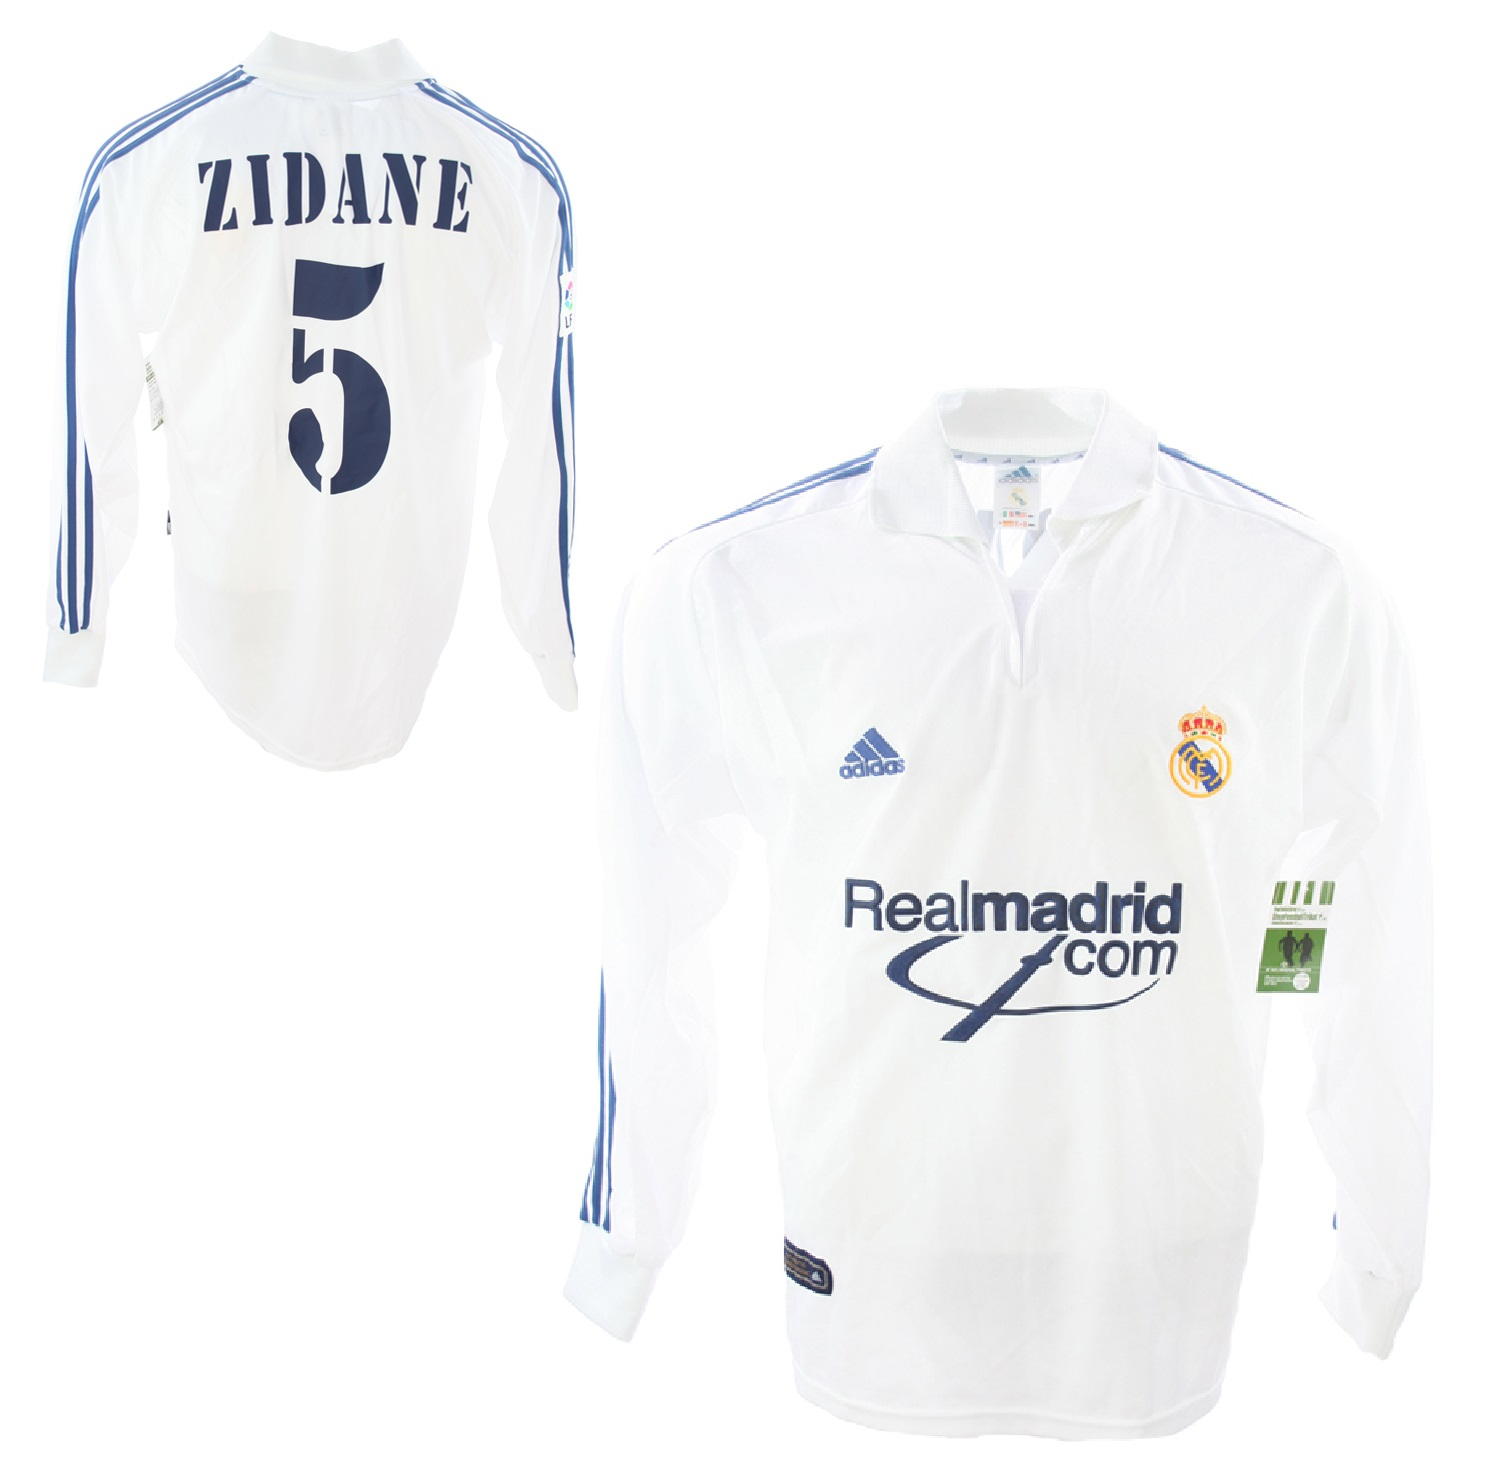 premium selection 9a138 a6d99 Adidas Real Madrid jersey 5 Zinedine Zidane 2001/02 home ...